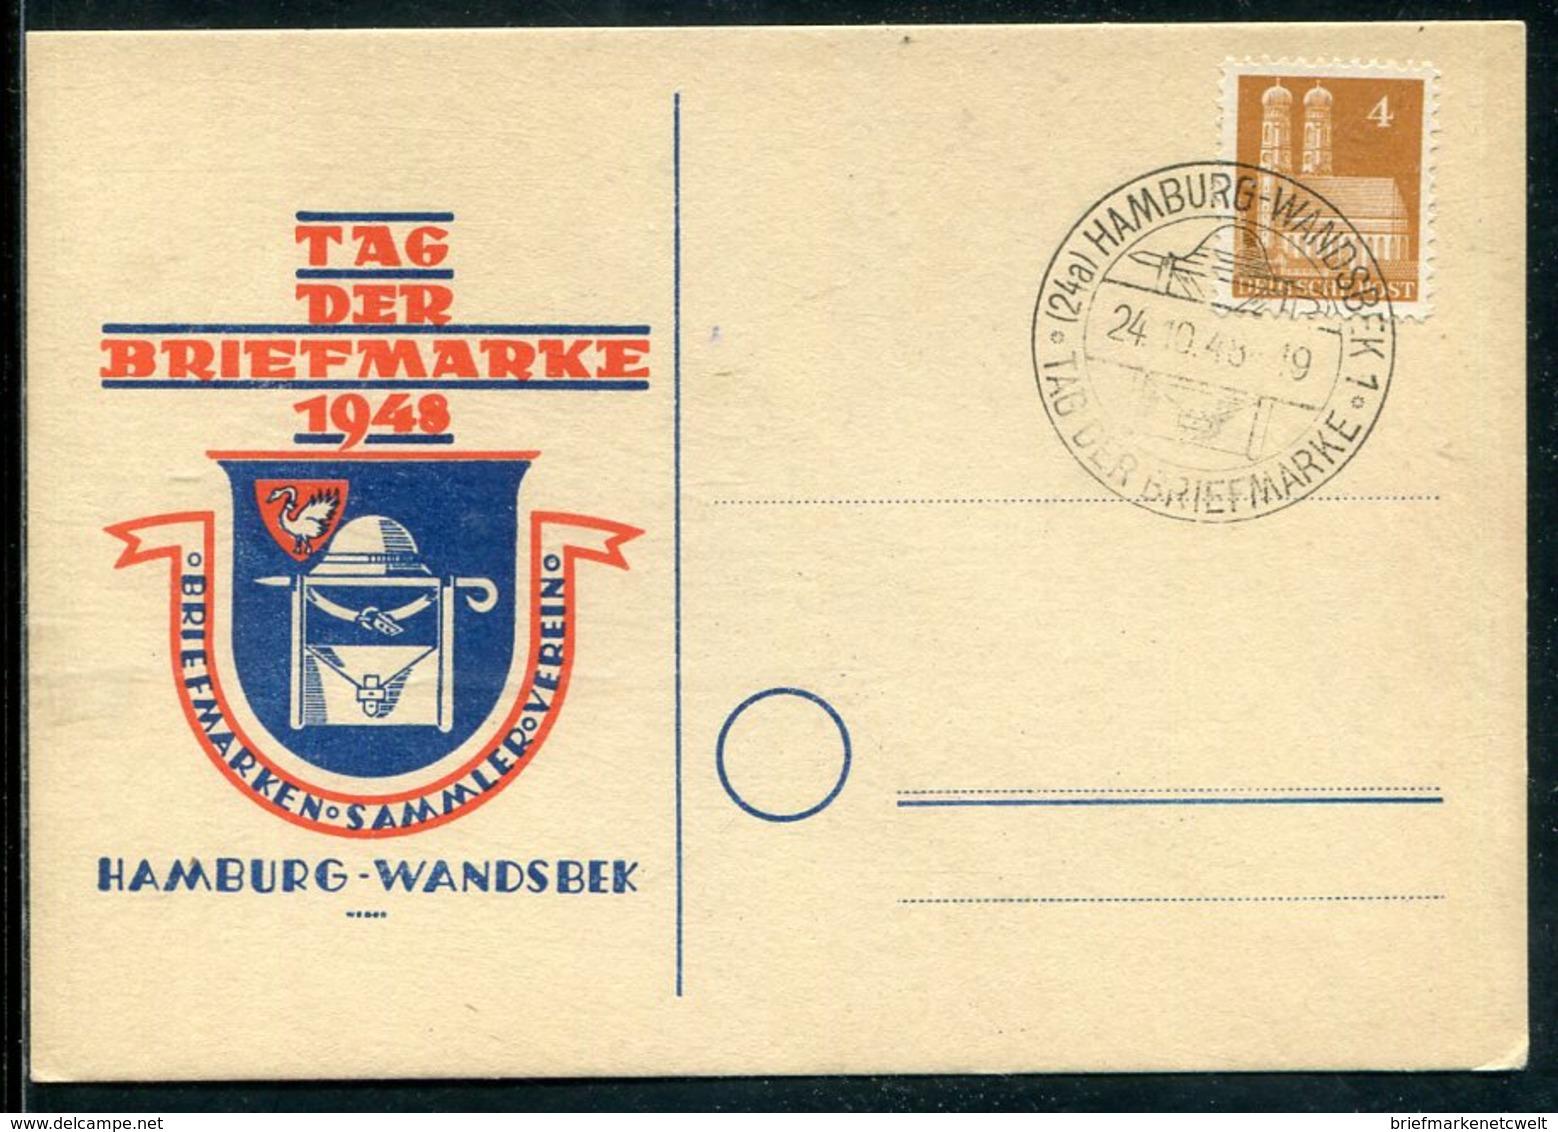 "Bizone / 1948 / So-Beleg ""Tag Der Briefmarke"", So-Stempel HAMBURG-WANDSBEK (11308) - Bizone"